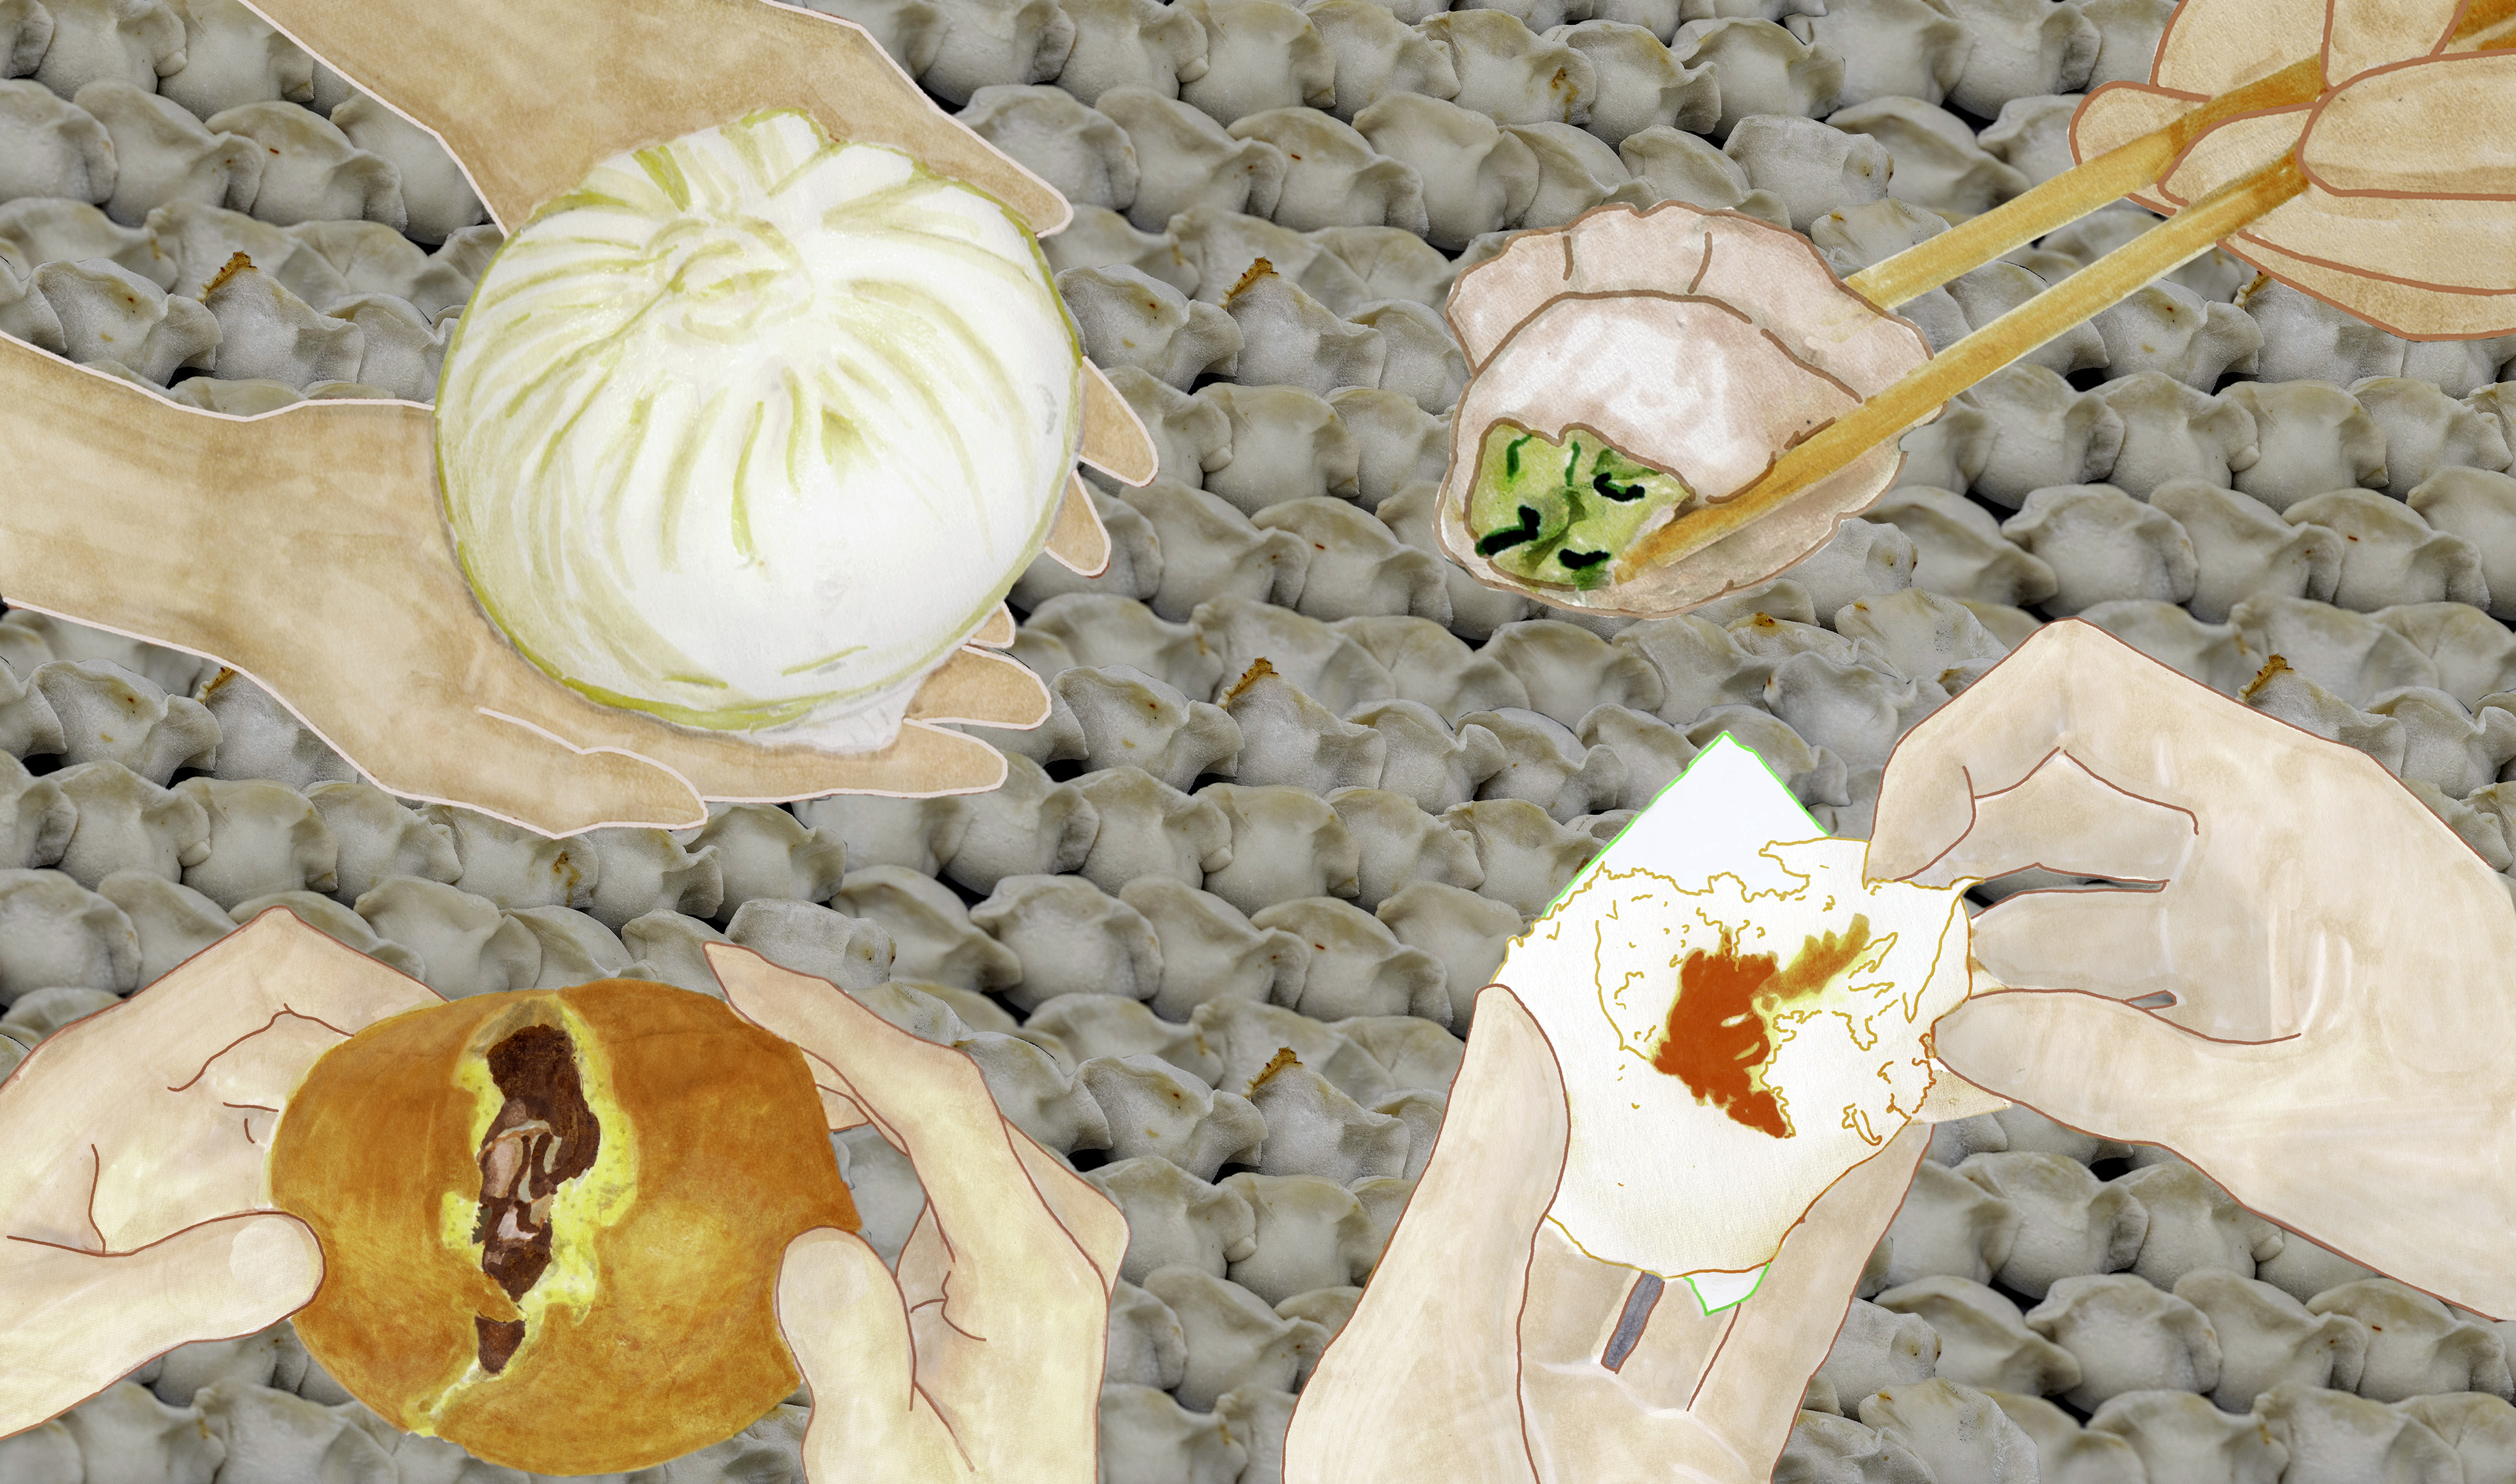 A multicultural assortment of dumplings